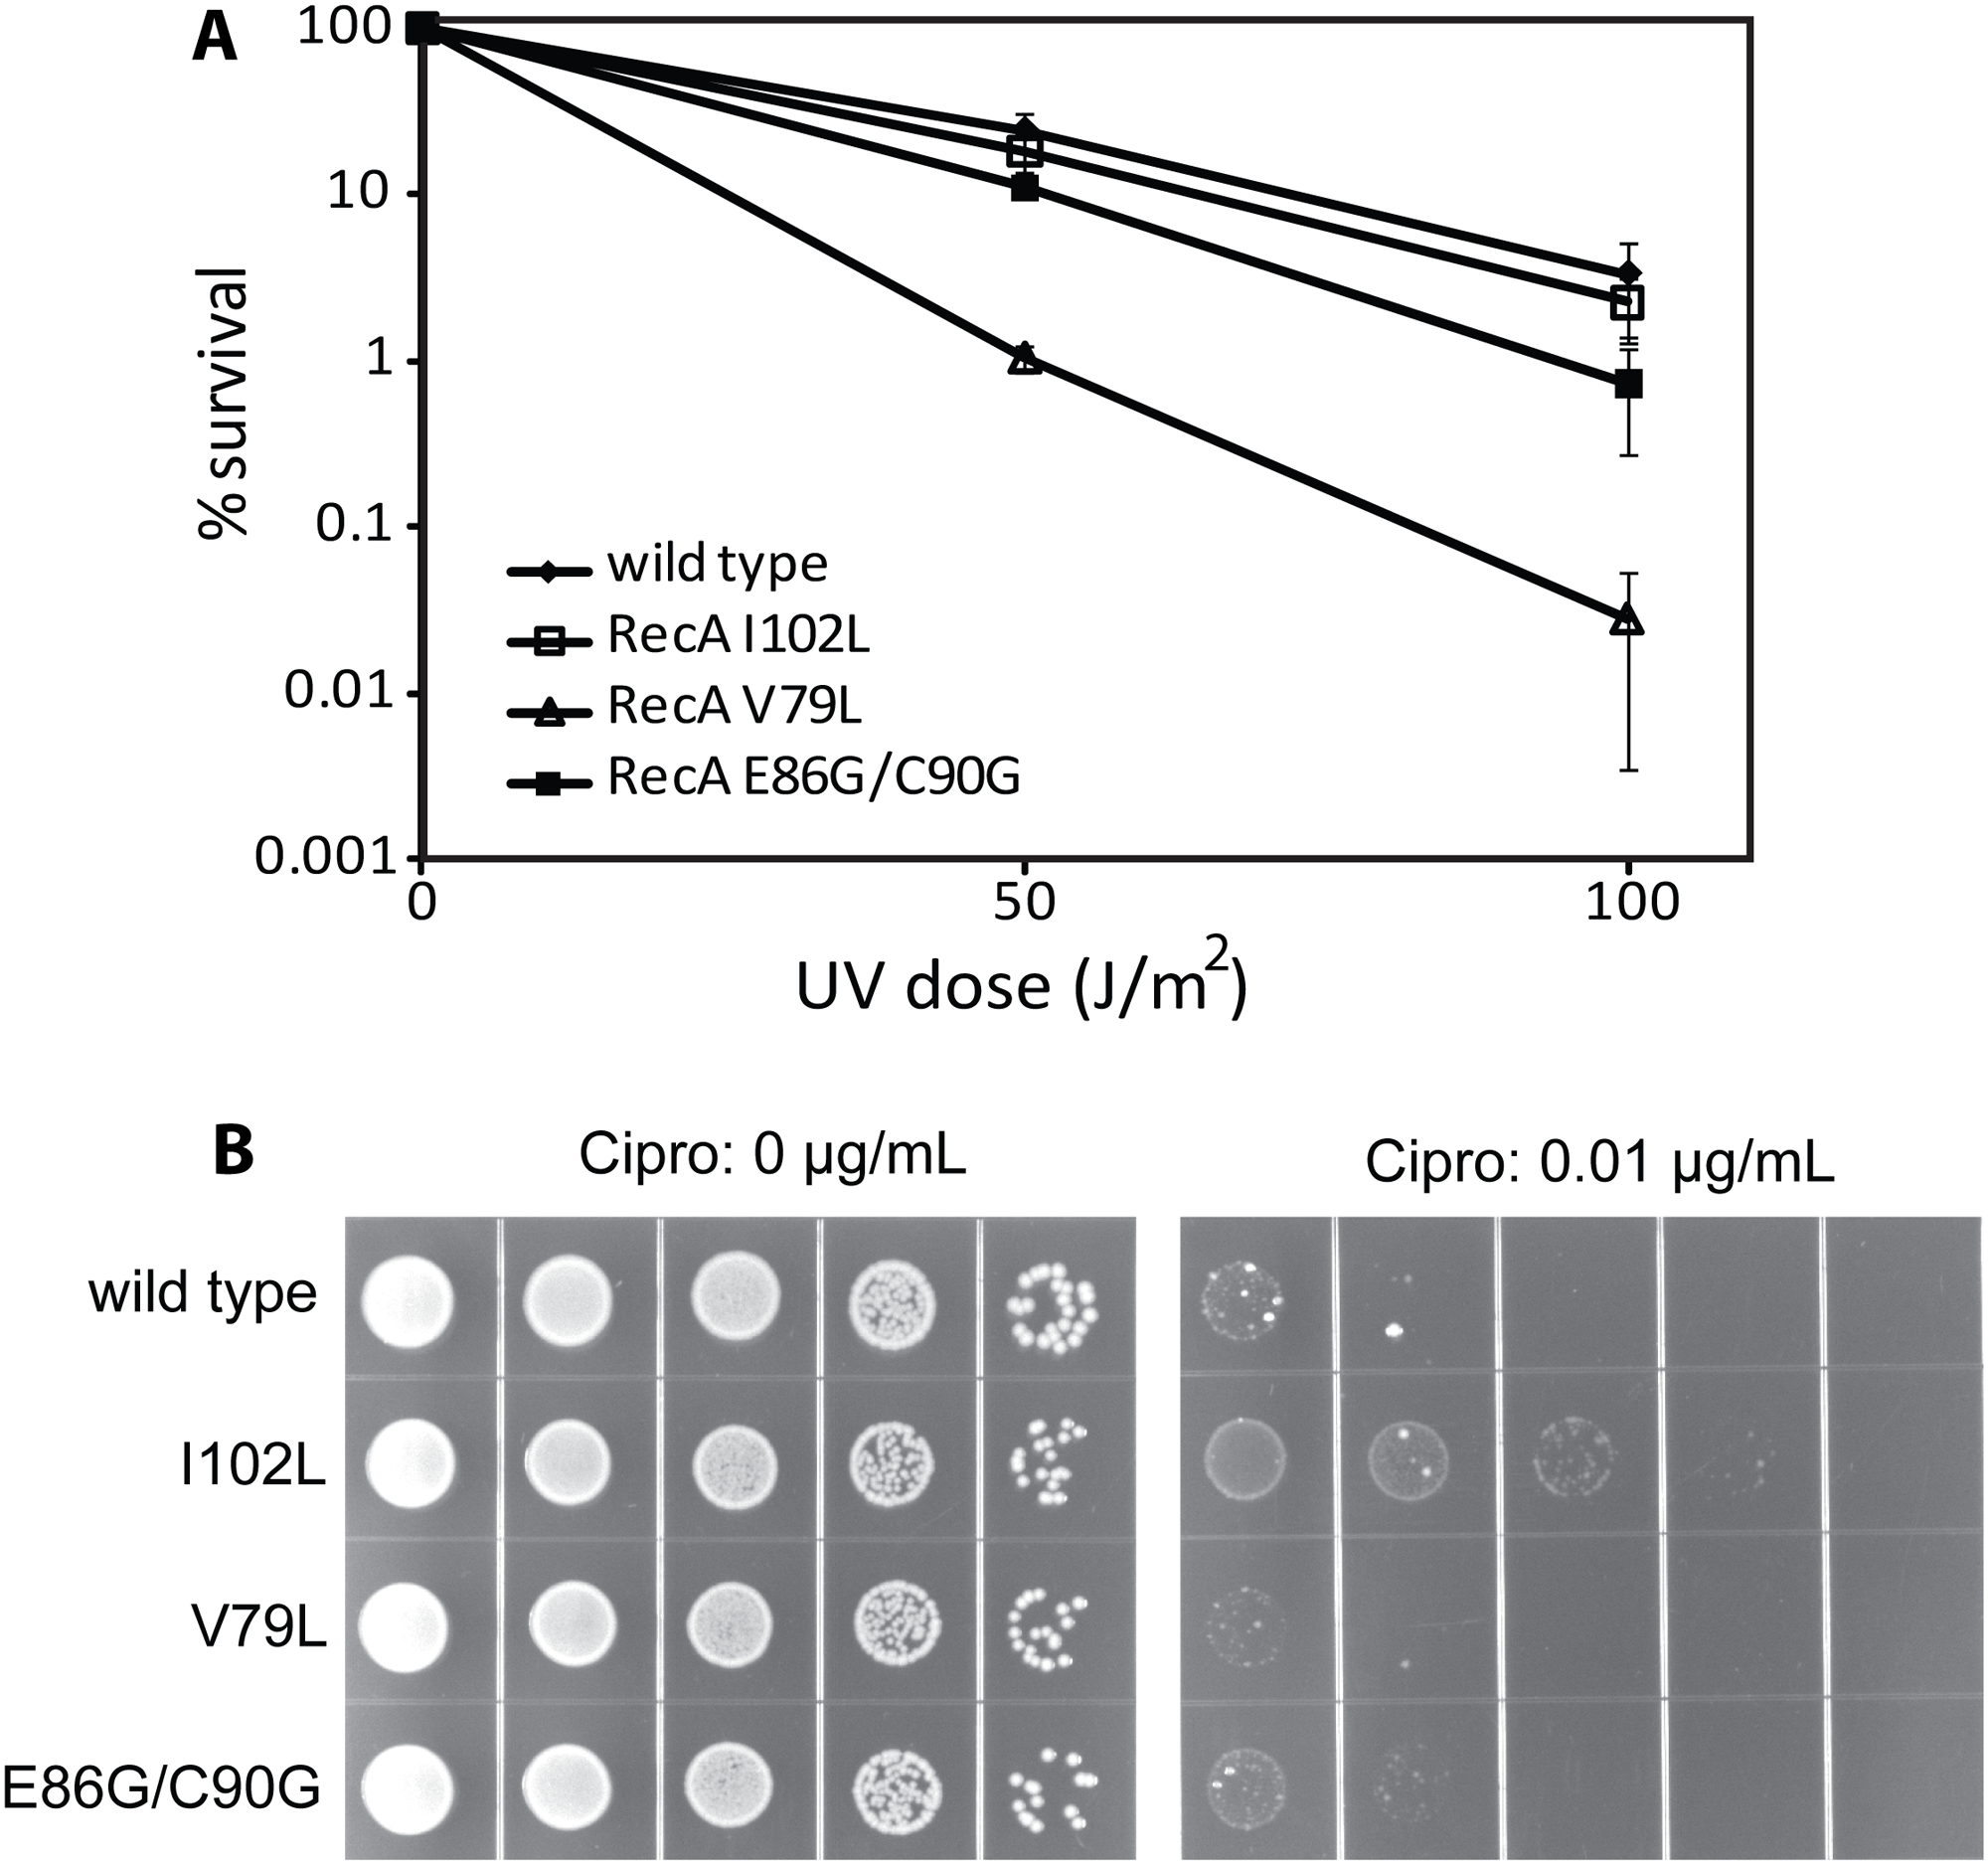 The effects of RecA variants on UV radiation and ciprofloxacin sensitivity.